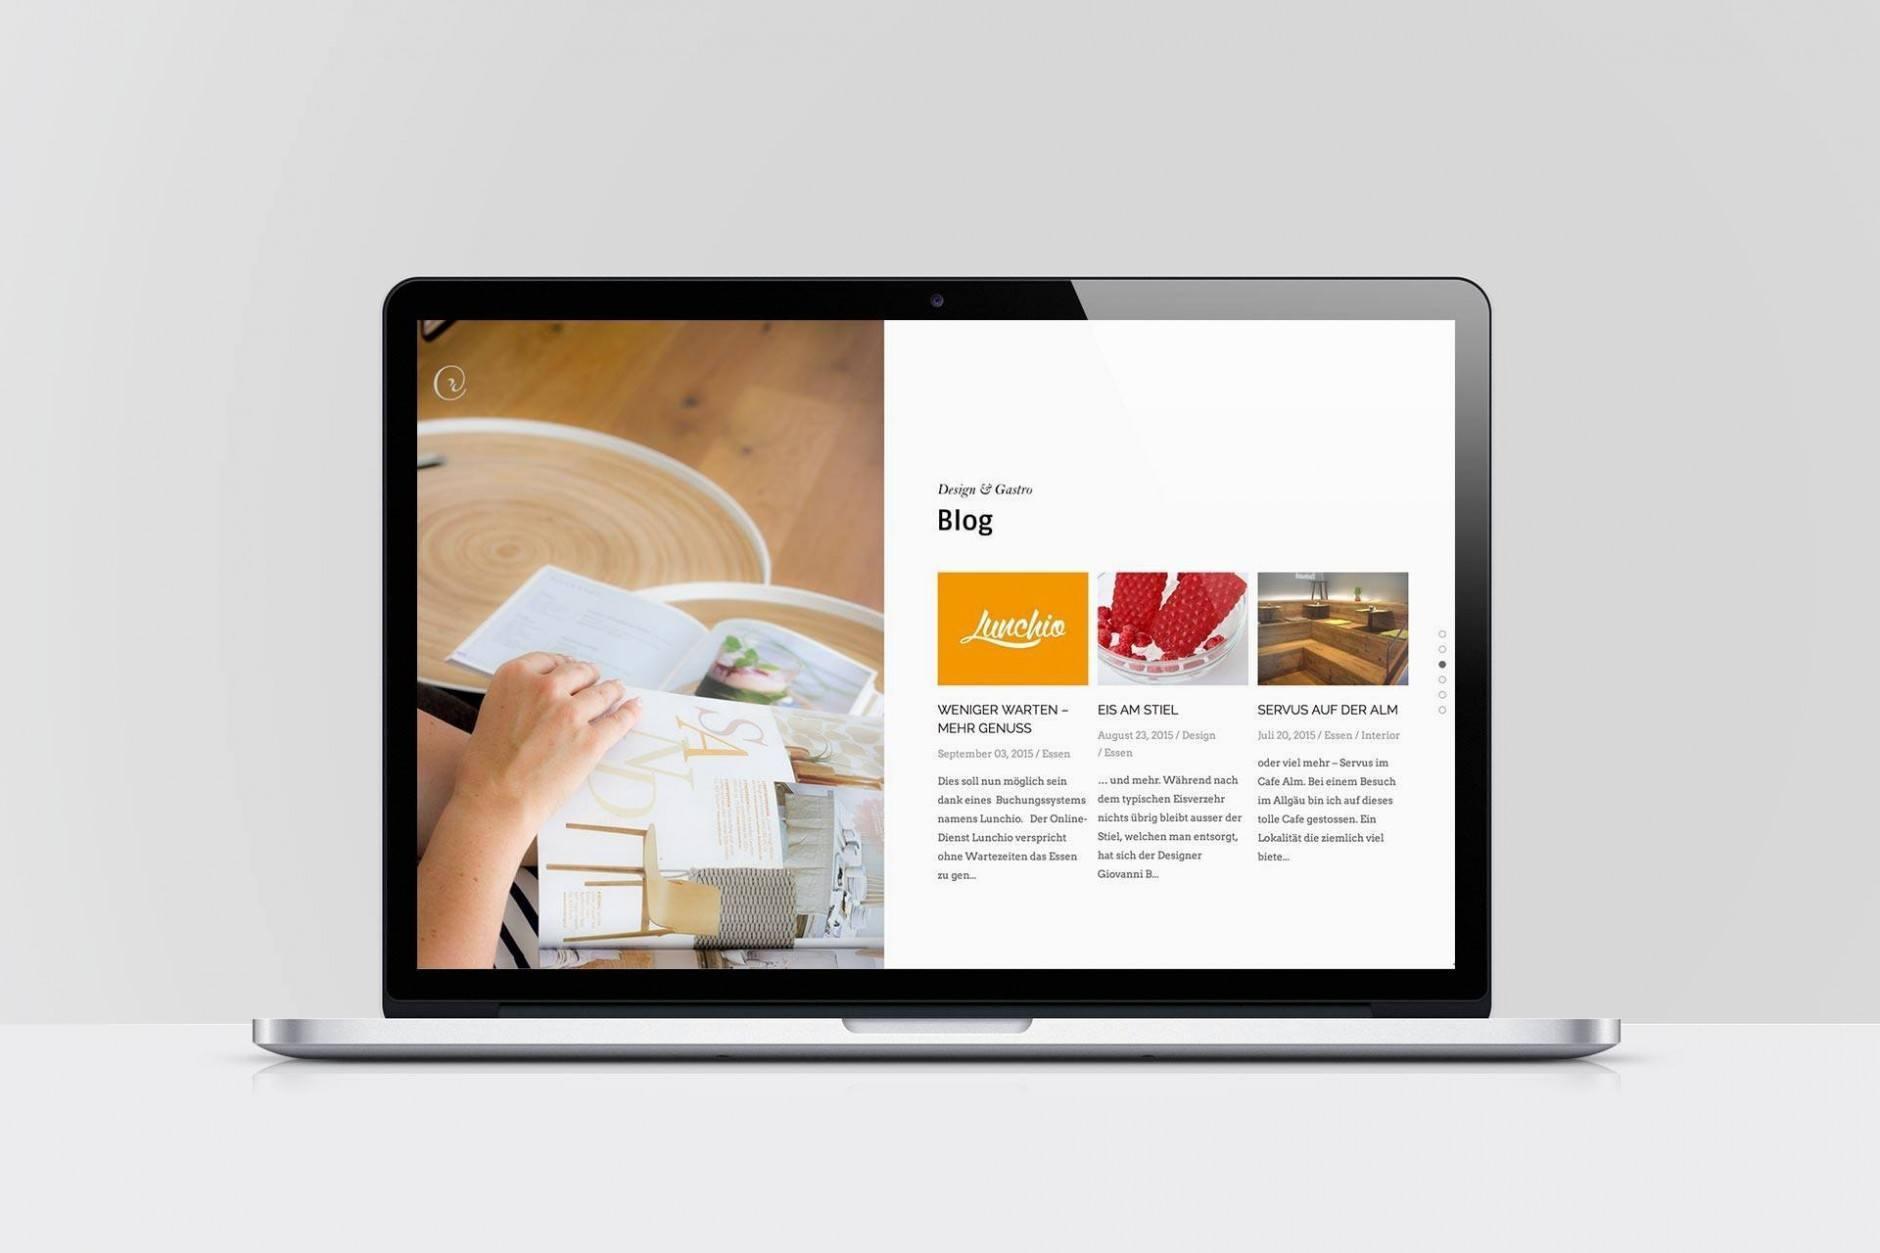 website_mockup_einzeln_macbook